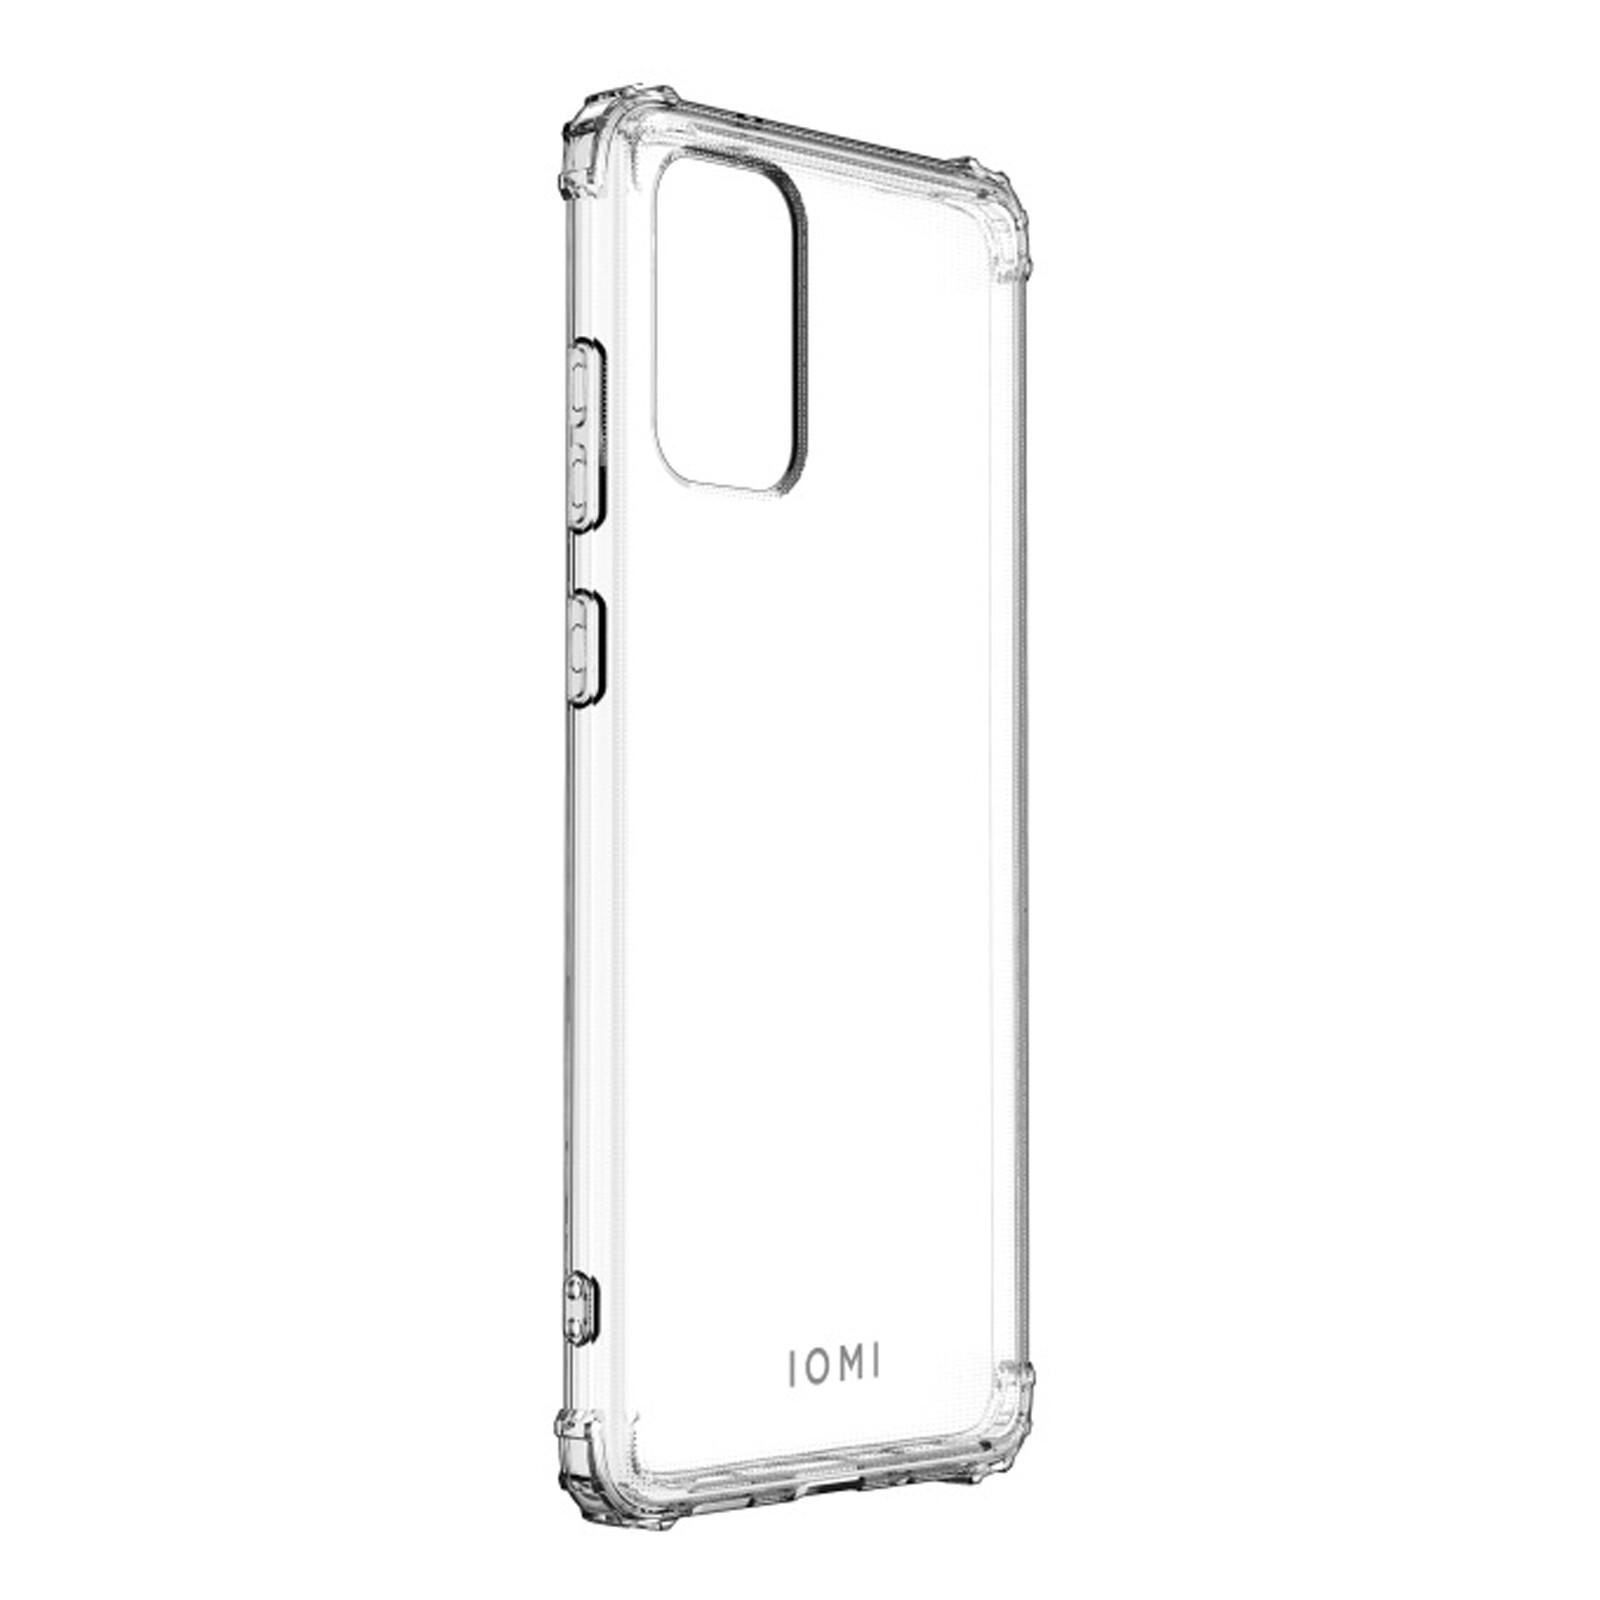 IOMI Backcover Shockproof Samsung Galaxy S20+